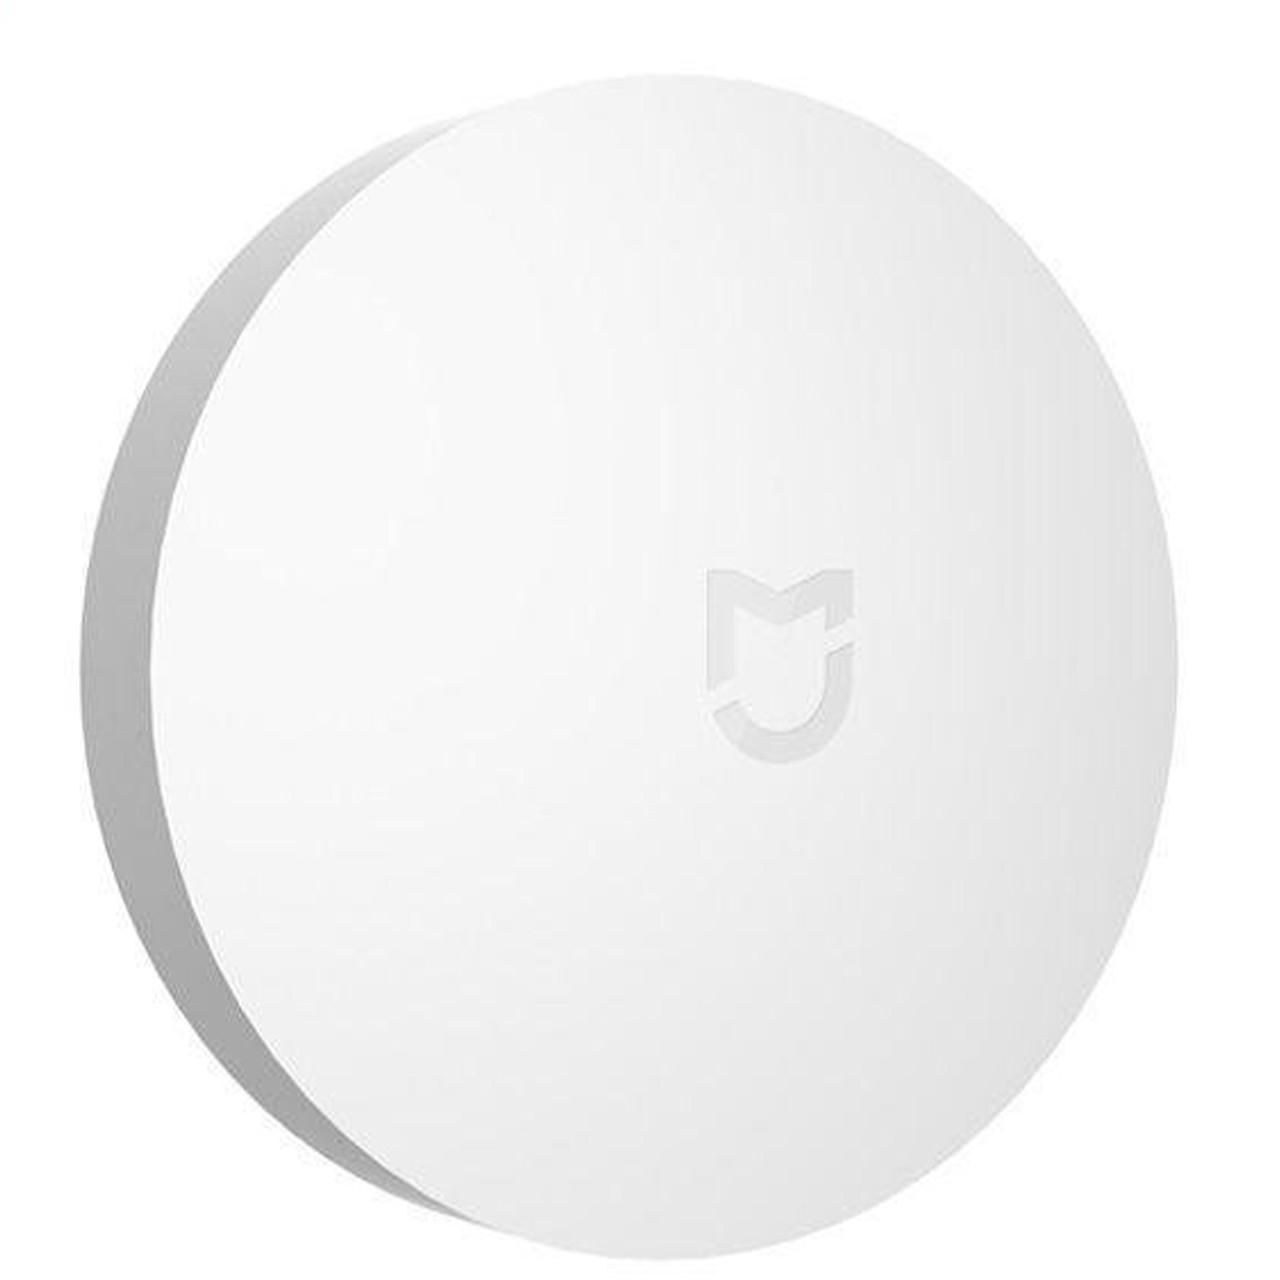 Умная кнопка Xiaomi MiJia Wireless Switch для смарт дома